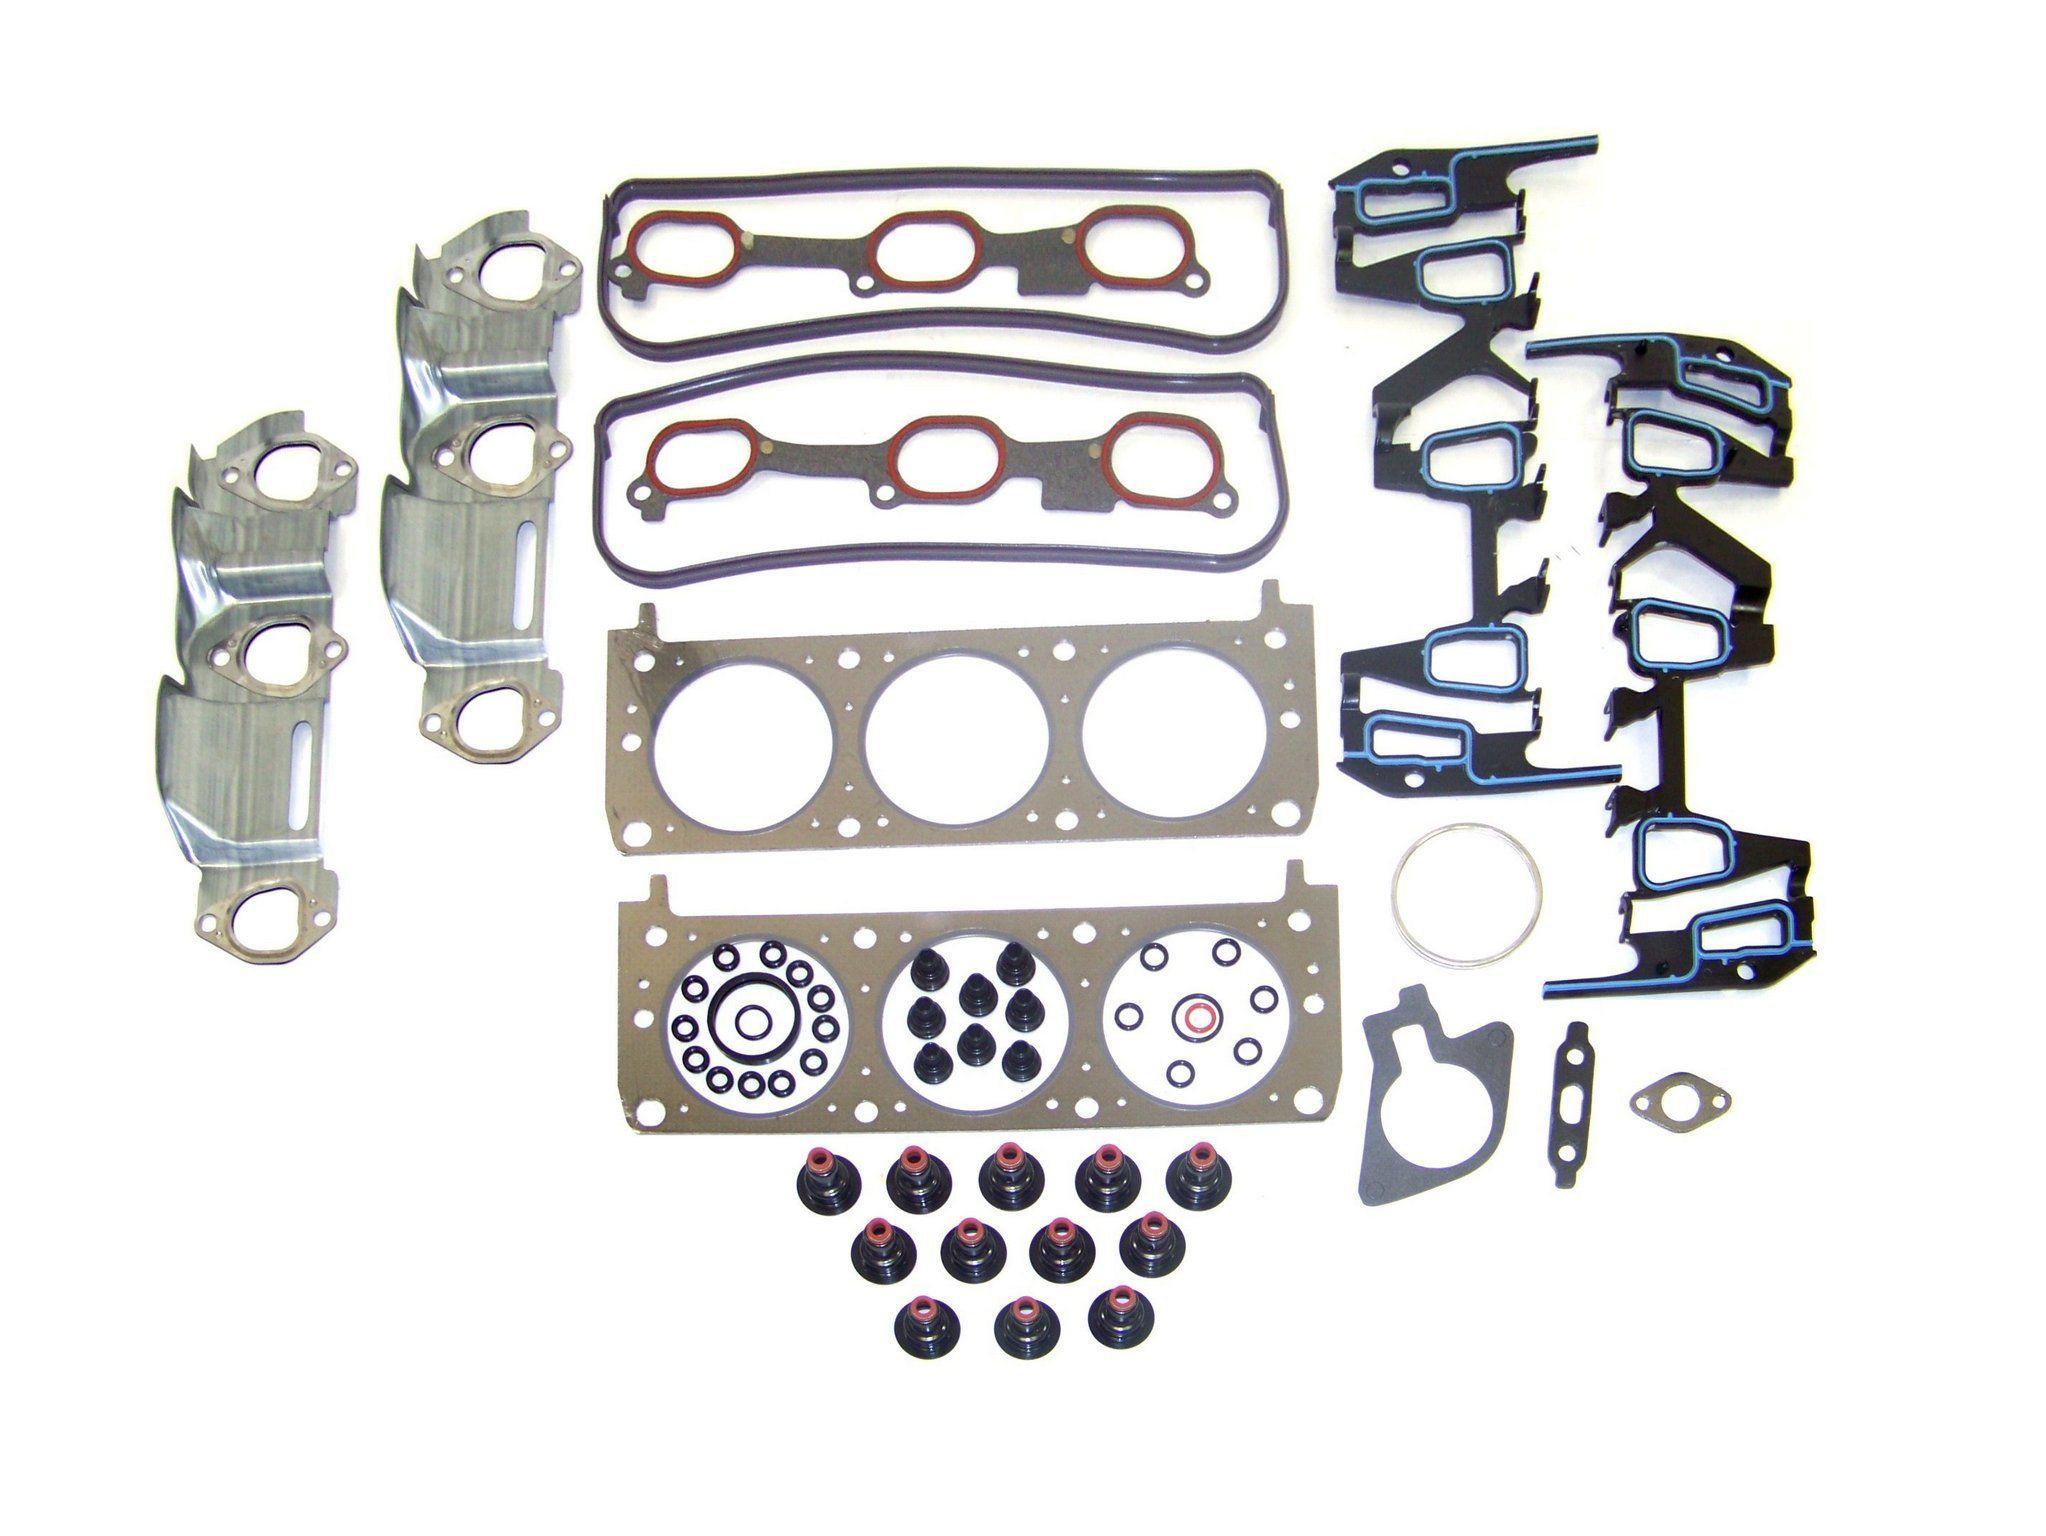 Chevrolet Impala Engine Cylinder Head Gasket Set Replacement DJ